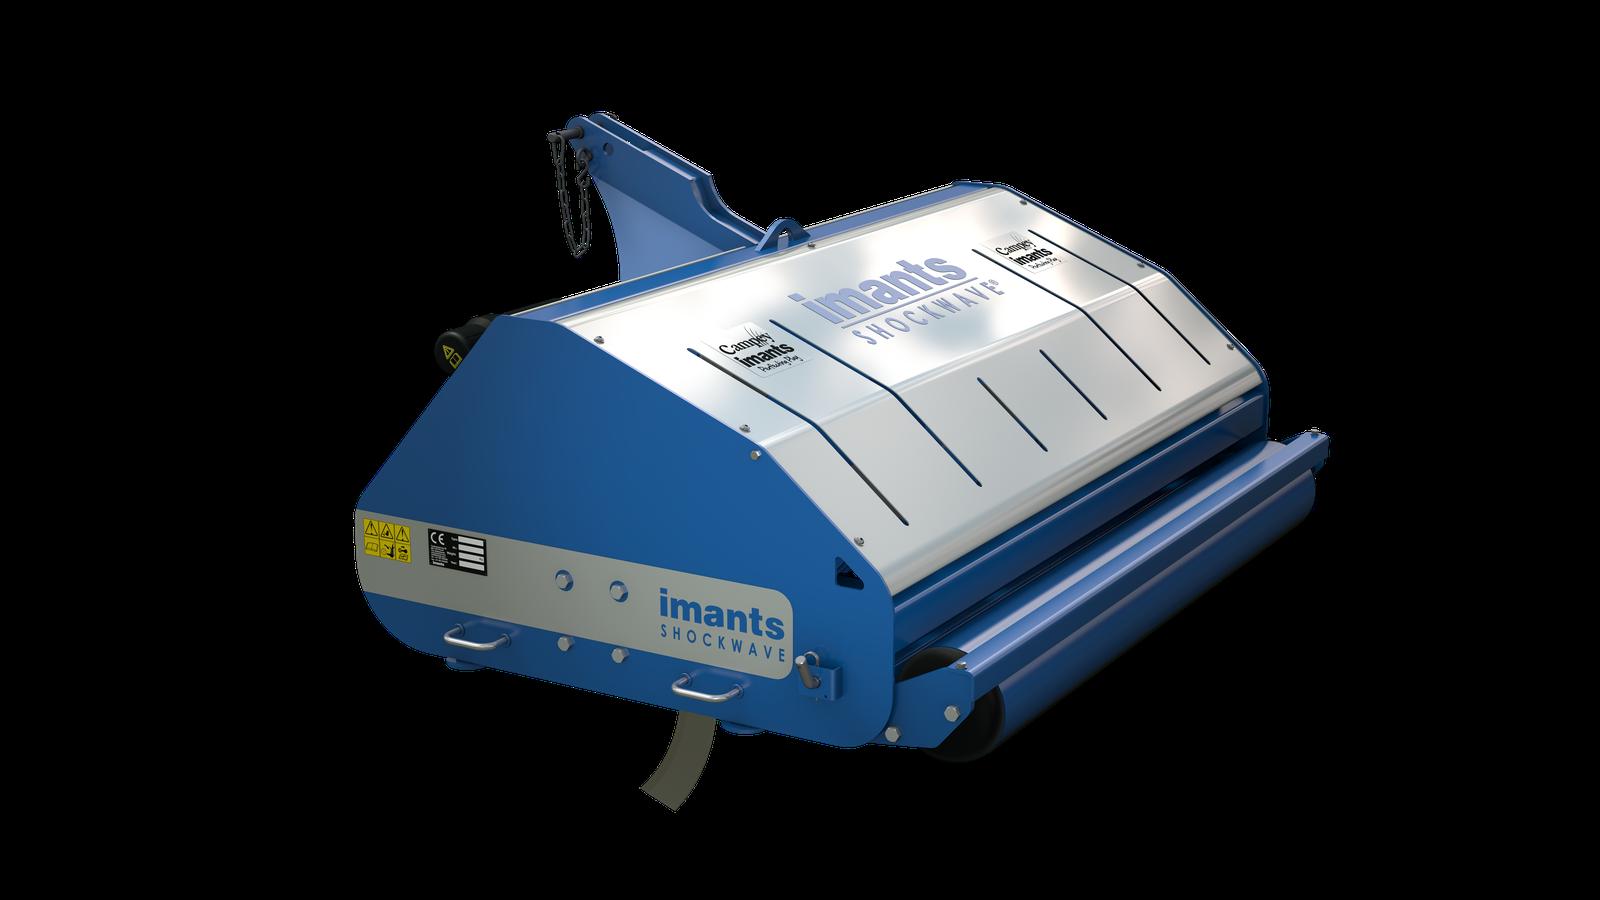 Dekompaktor liniowy IMANTS ShockWave